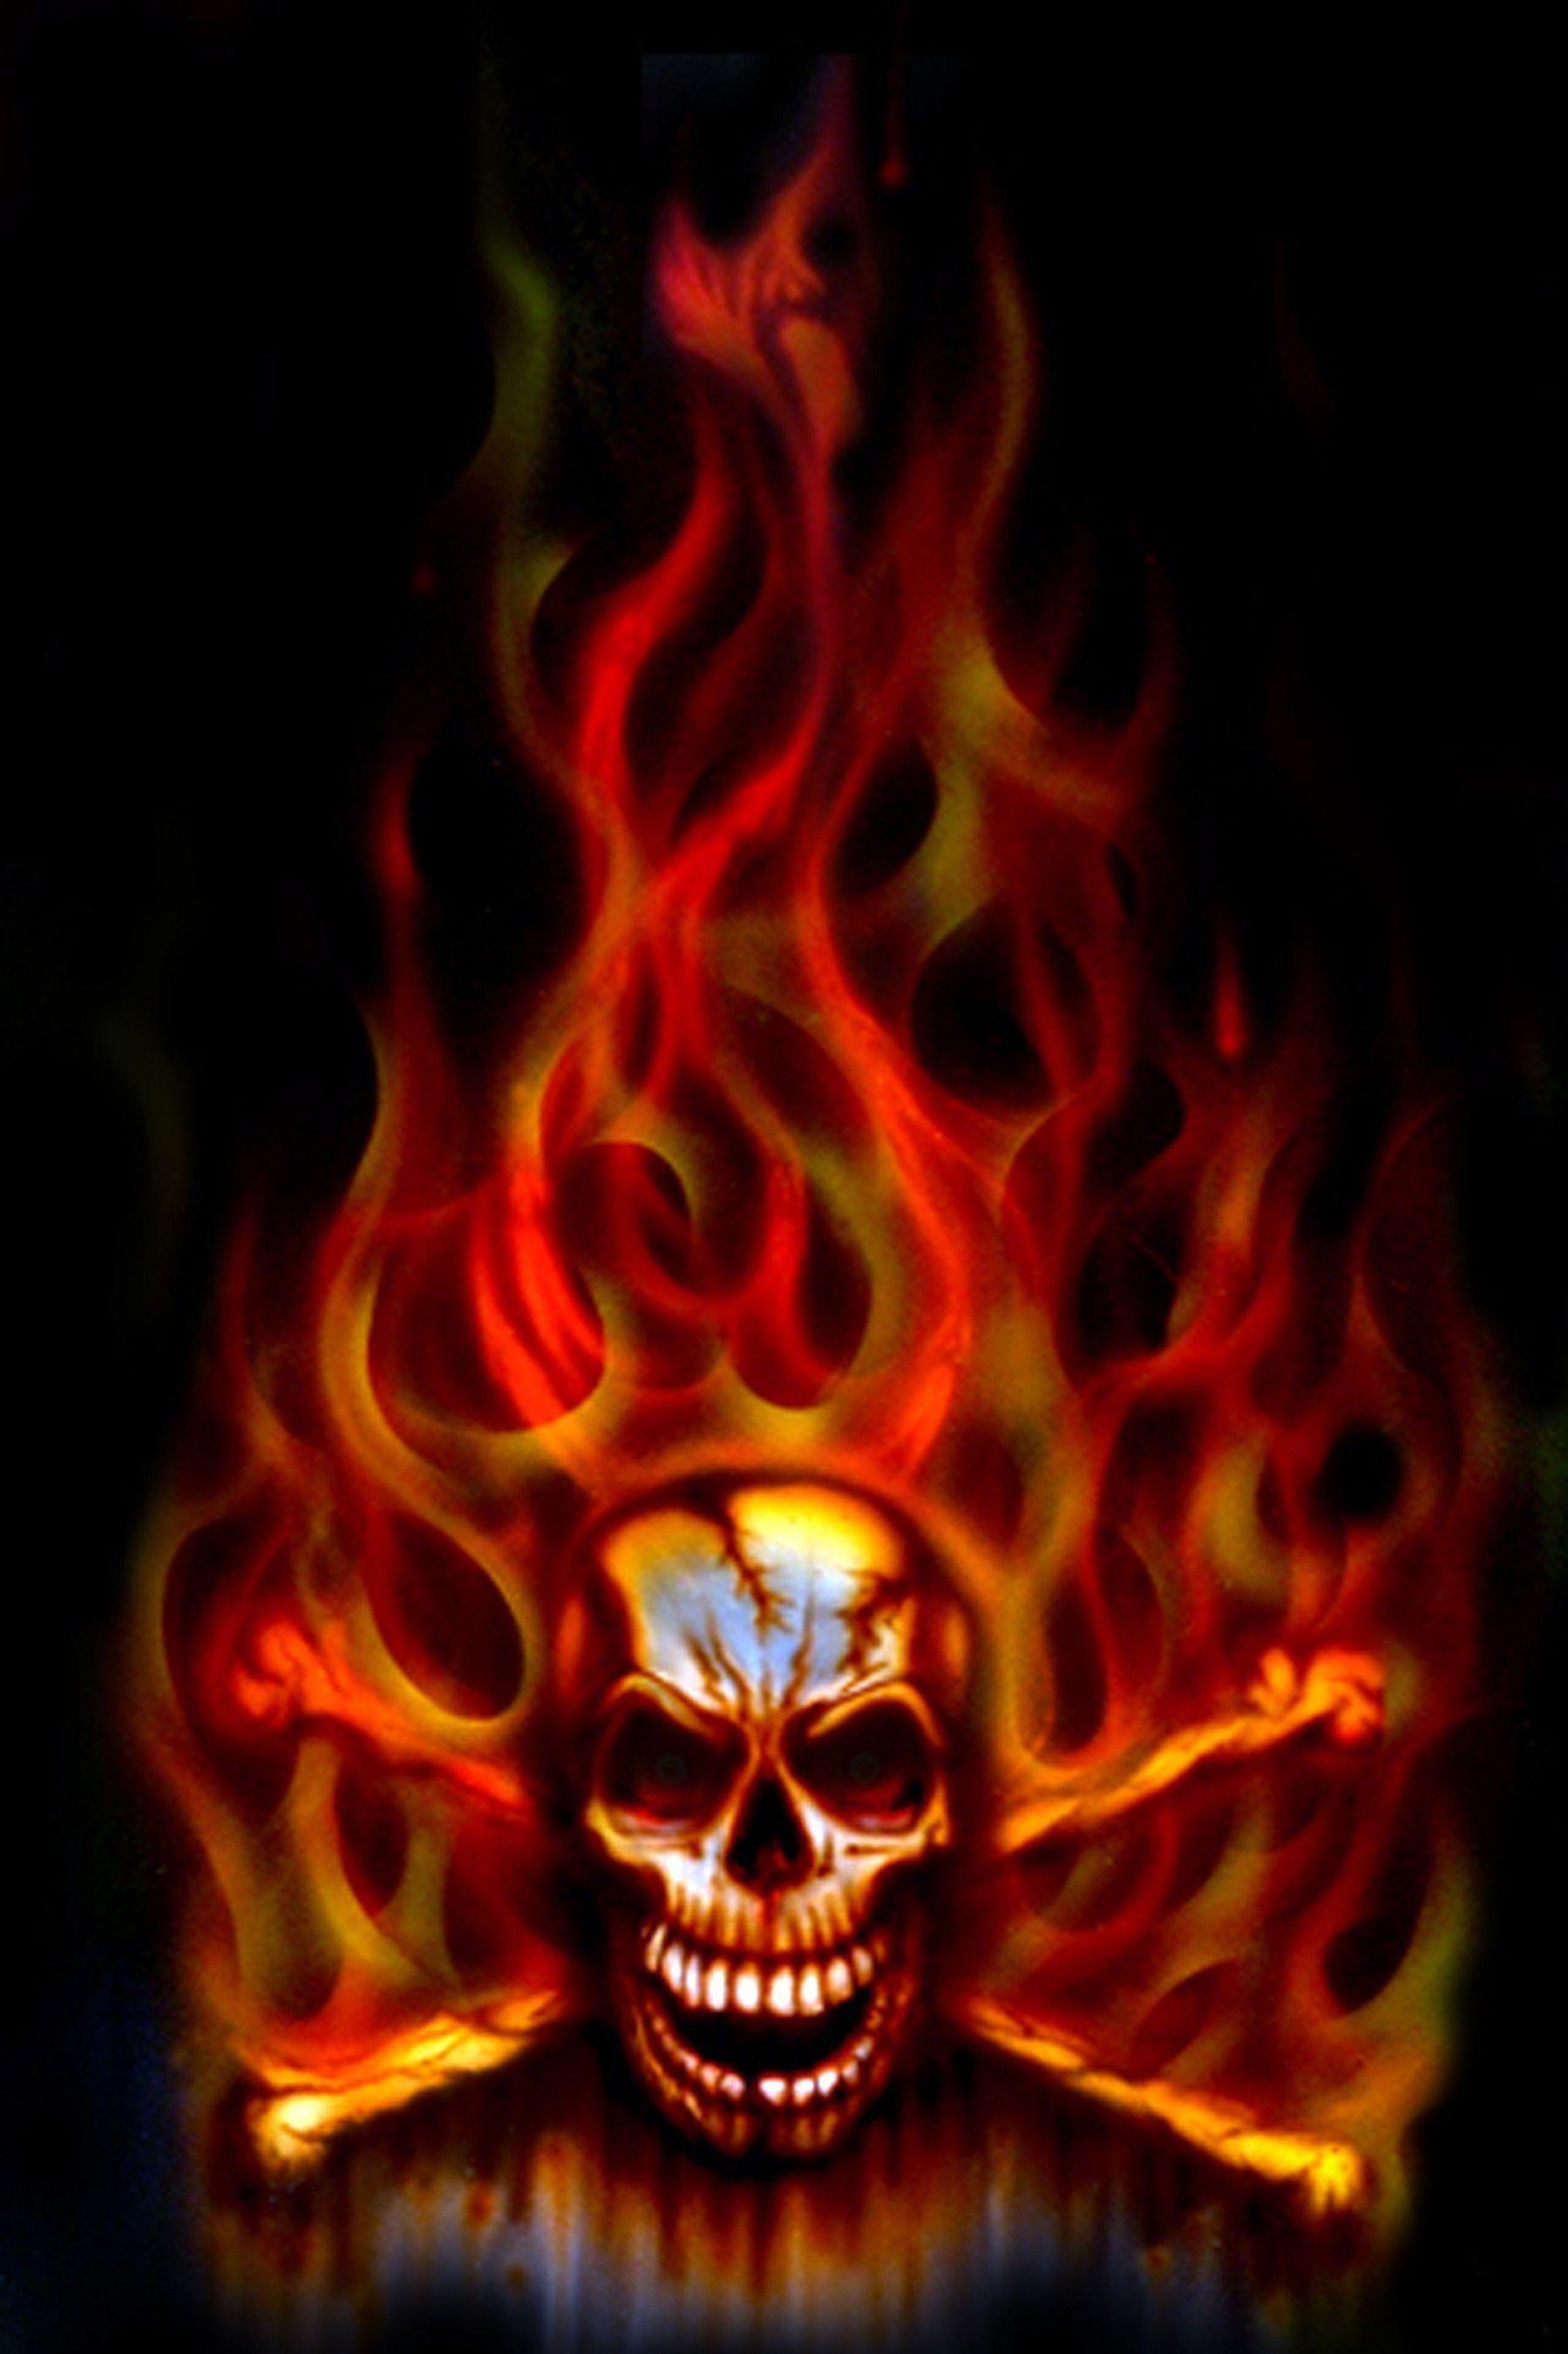 1799x2700 Images For Green Flaming Skull Wallpaper